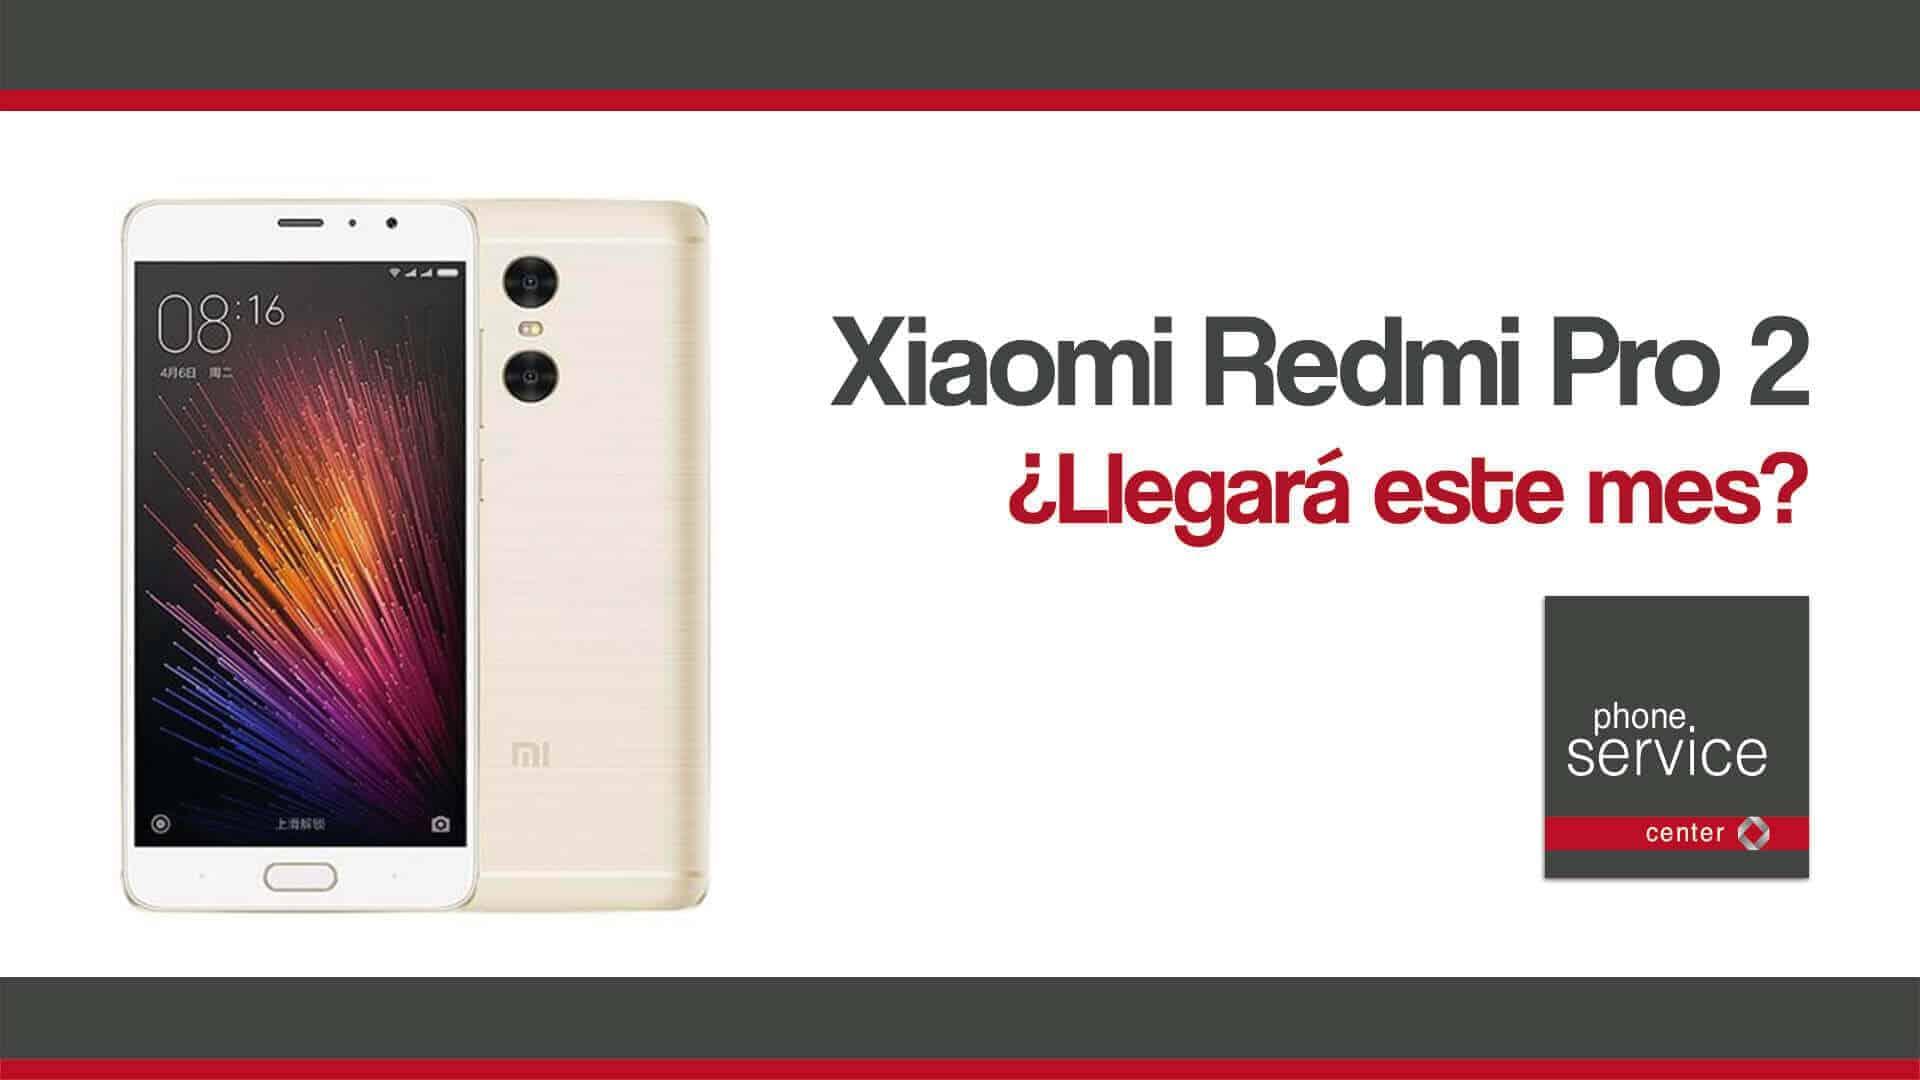 Xiaomi Redmi Pro 2 llegara este mes